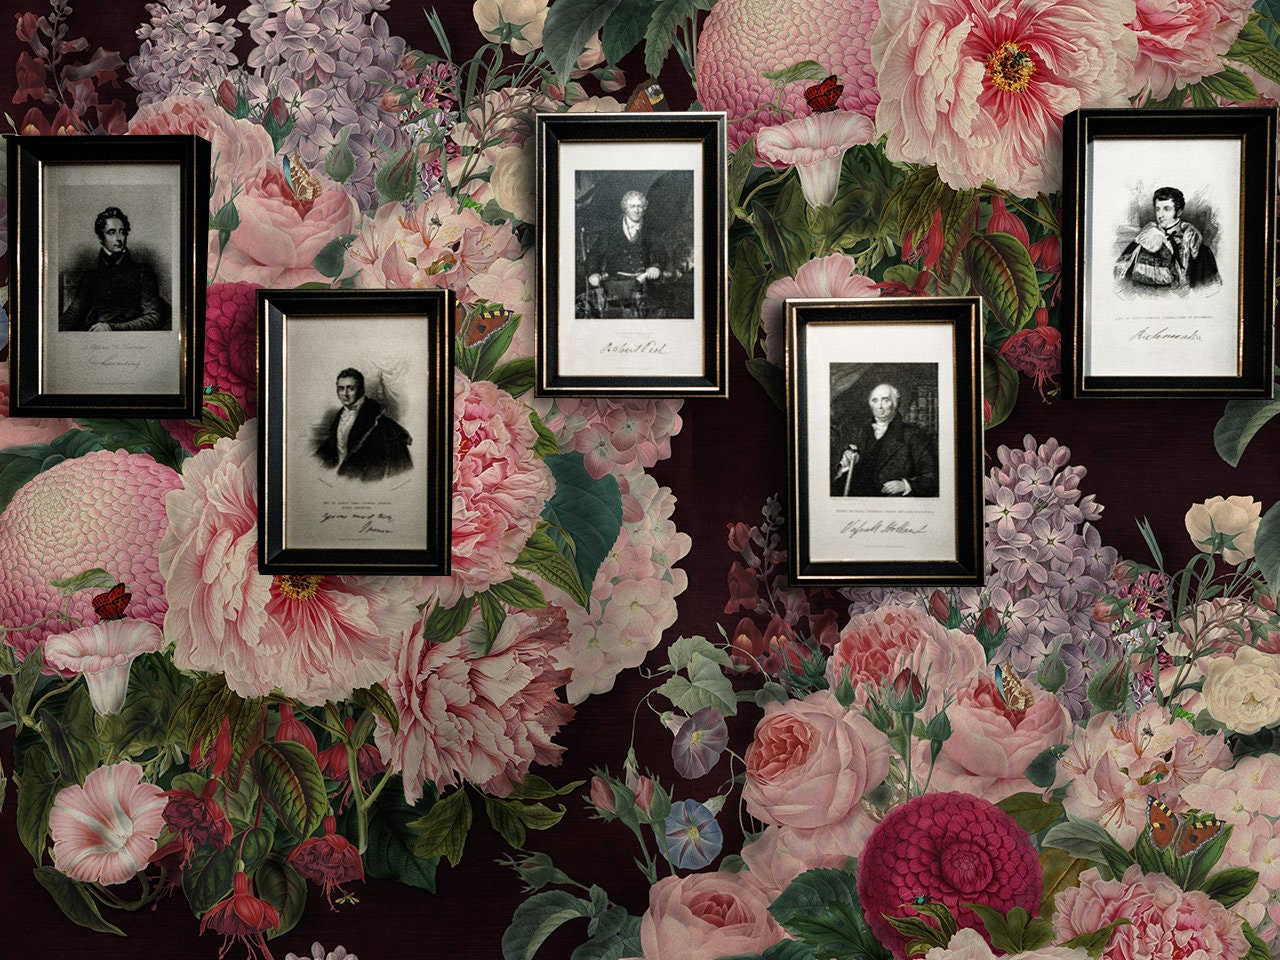 Wall Art, Kitchen Decor, Bedroom Decor, Kitchen Wall Decor, Bedroom Wall  Decor, Floral Decor, Decor, Floral Wallpaper, Flower WallPaper